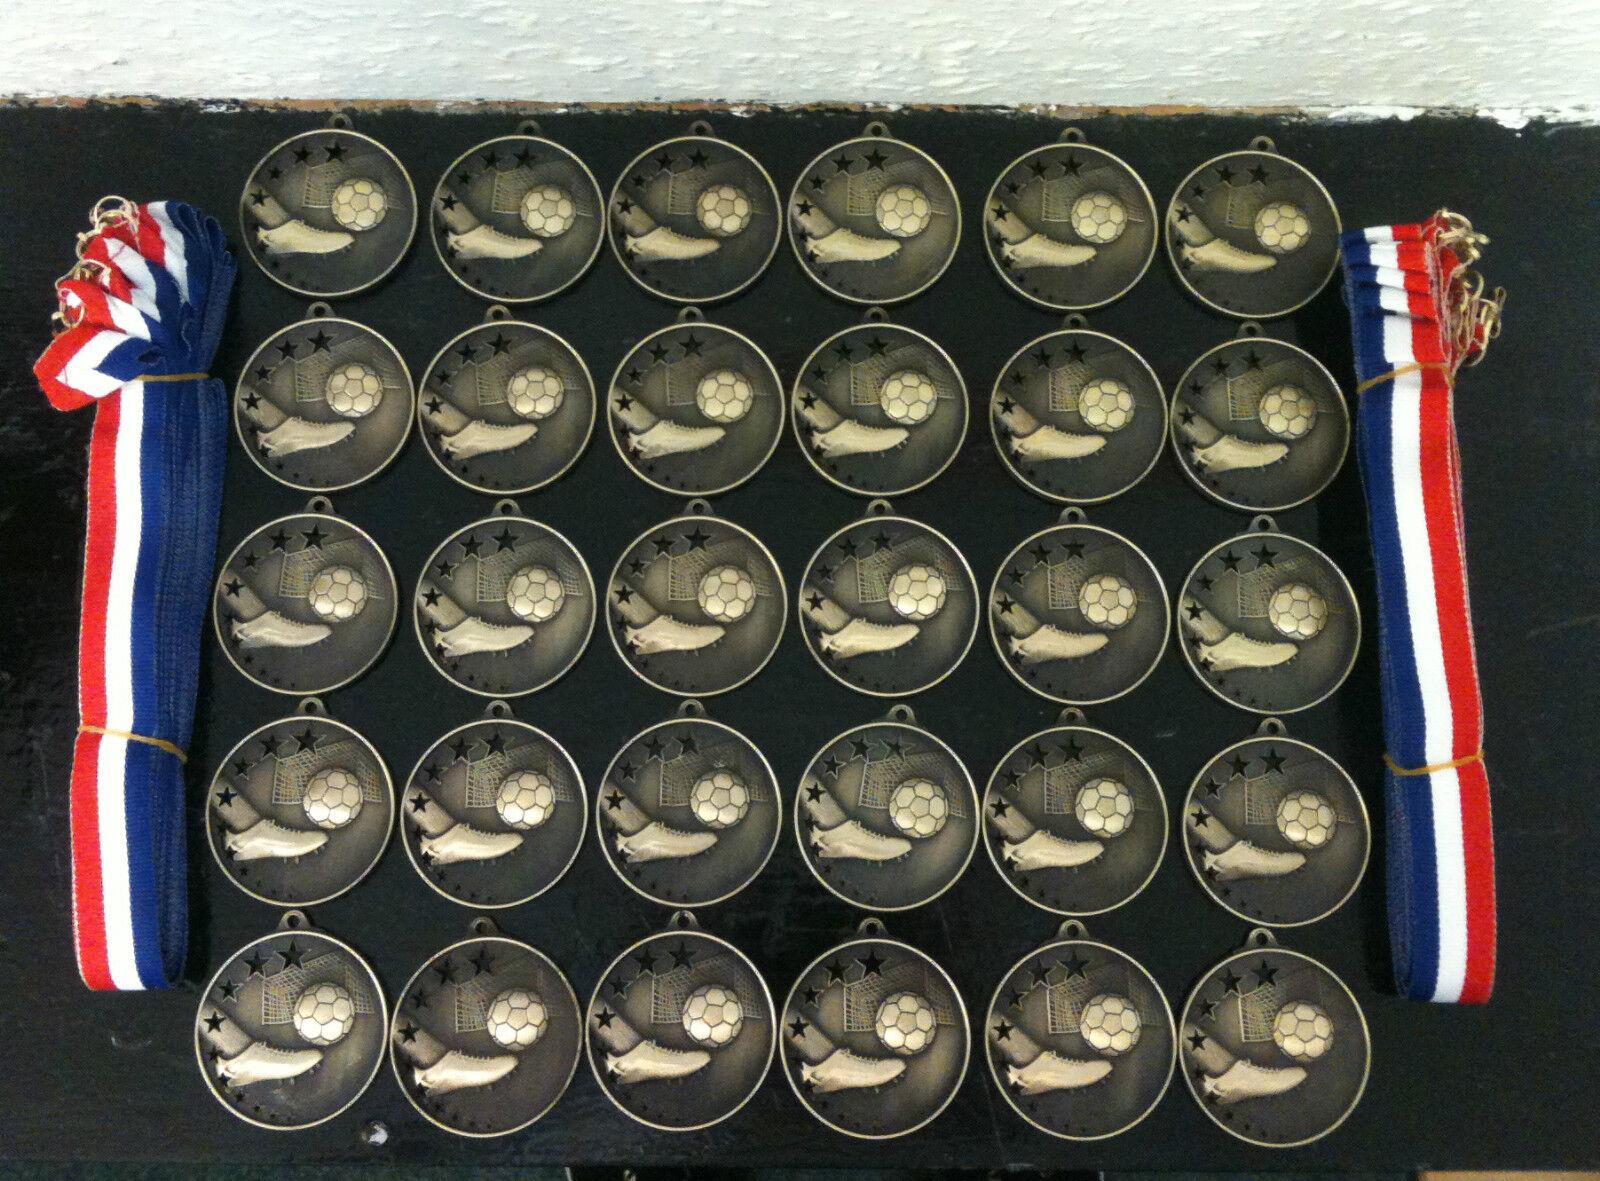 30 x Junior/Senior Football Medals (50mm BRONZE METAL) + Ribbons (AM502B)